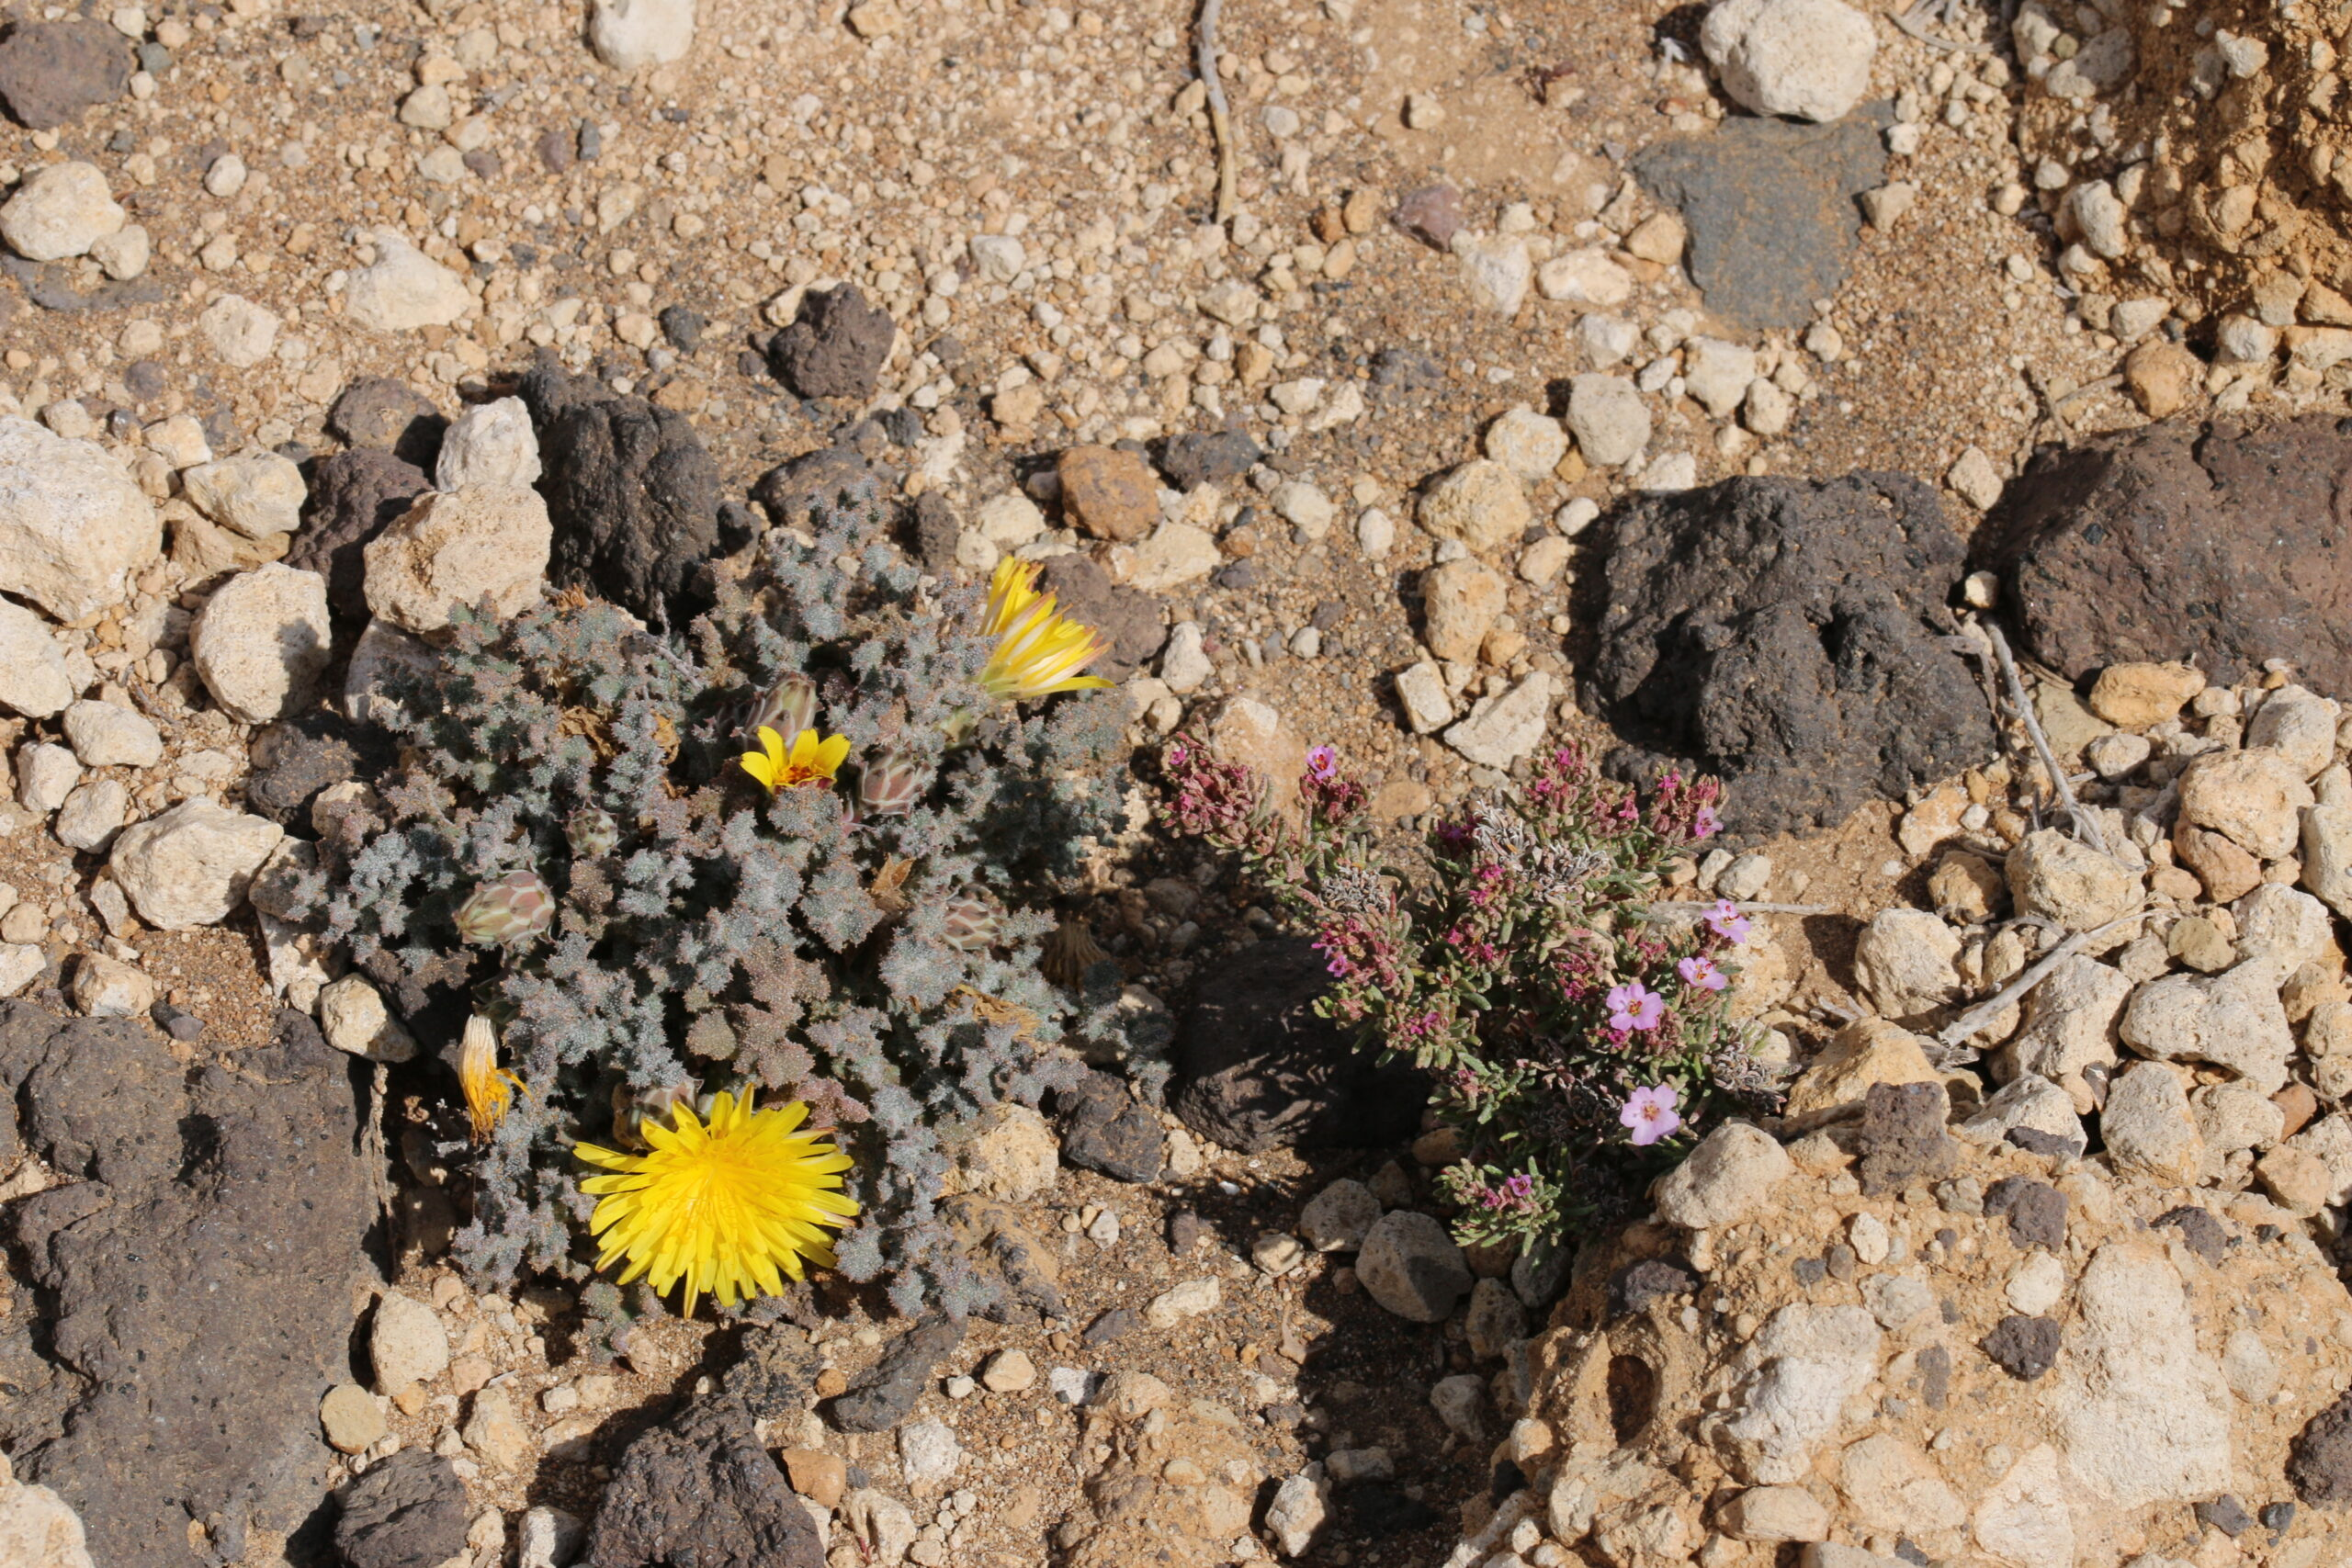 img_5934-habitat-materiales-pumiticos-reichardia-crystallina-scaled.jpg